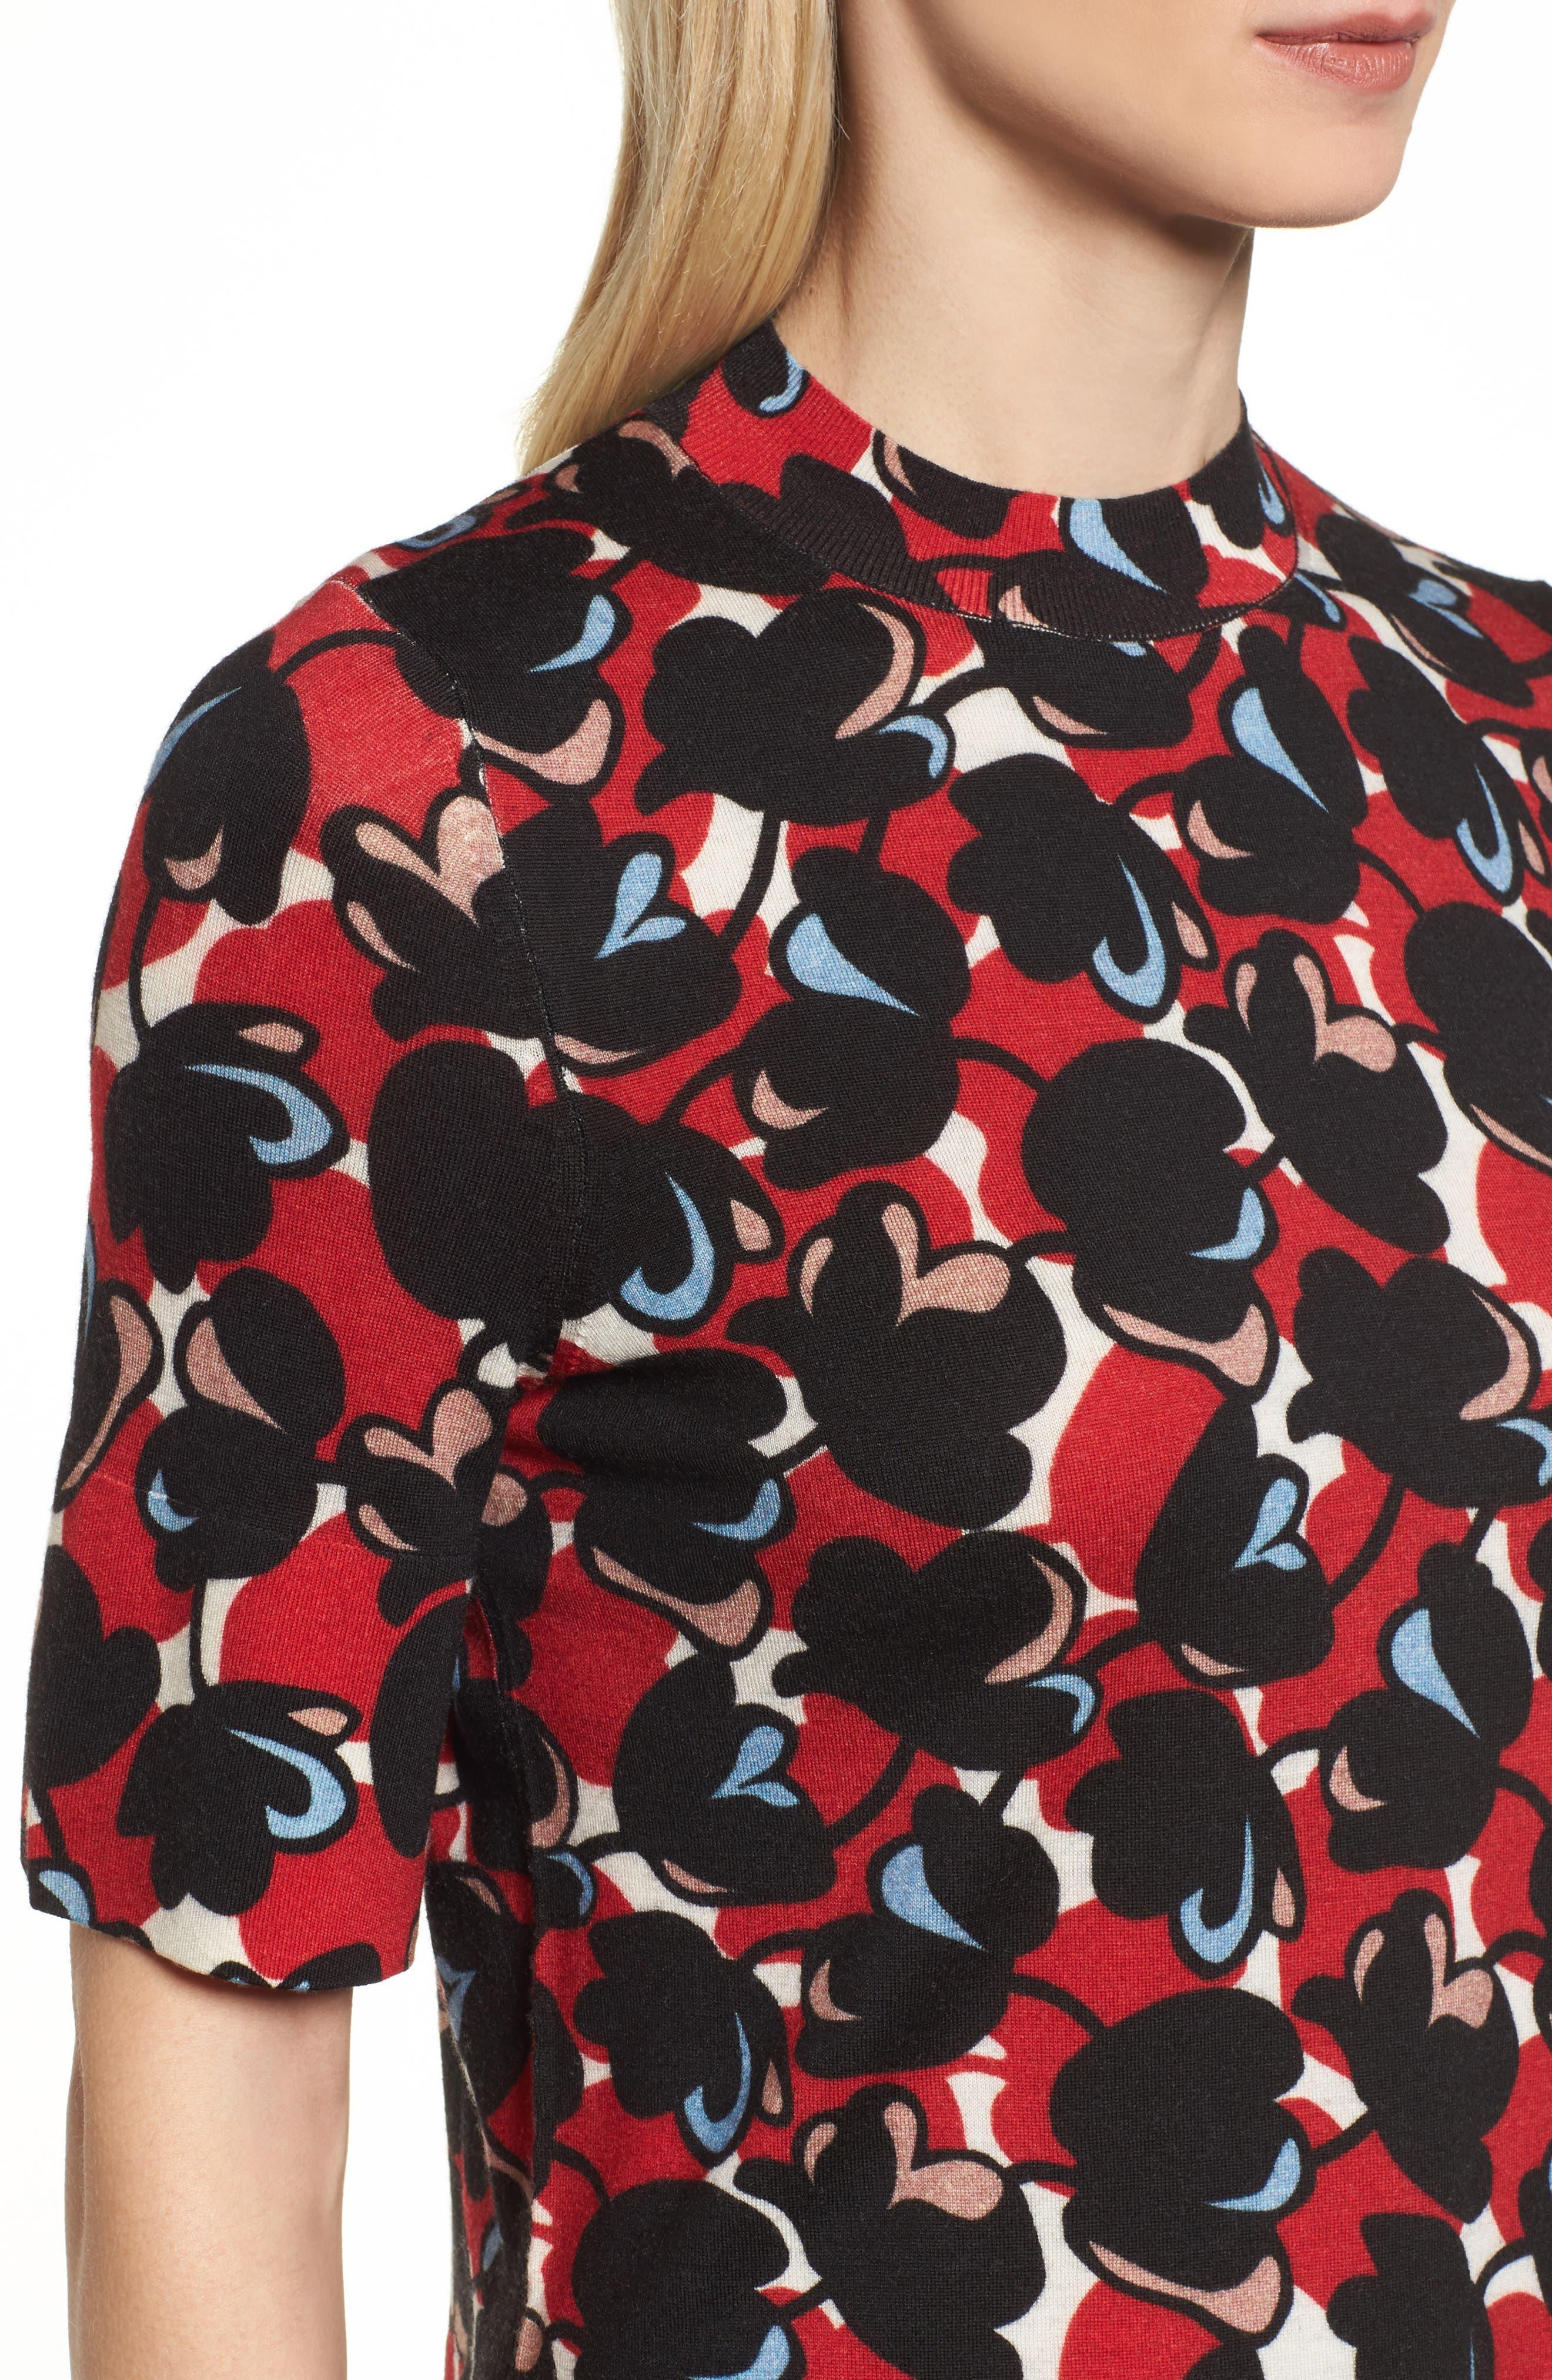 Fadeyka Print Wool Sweater,                             Alternate thumbnail 4, color,                             Flower Print